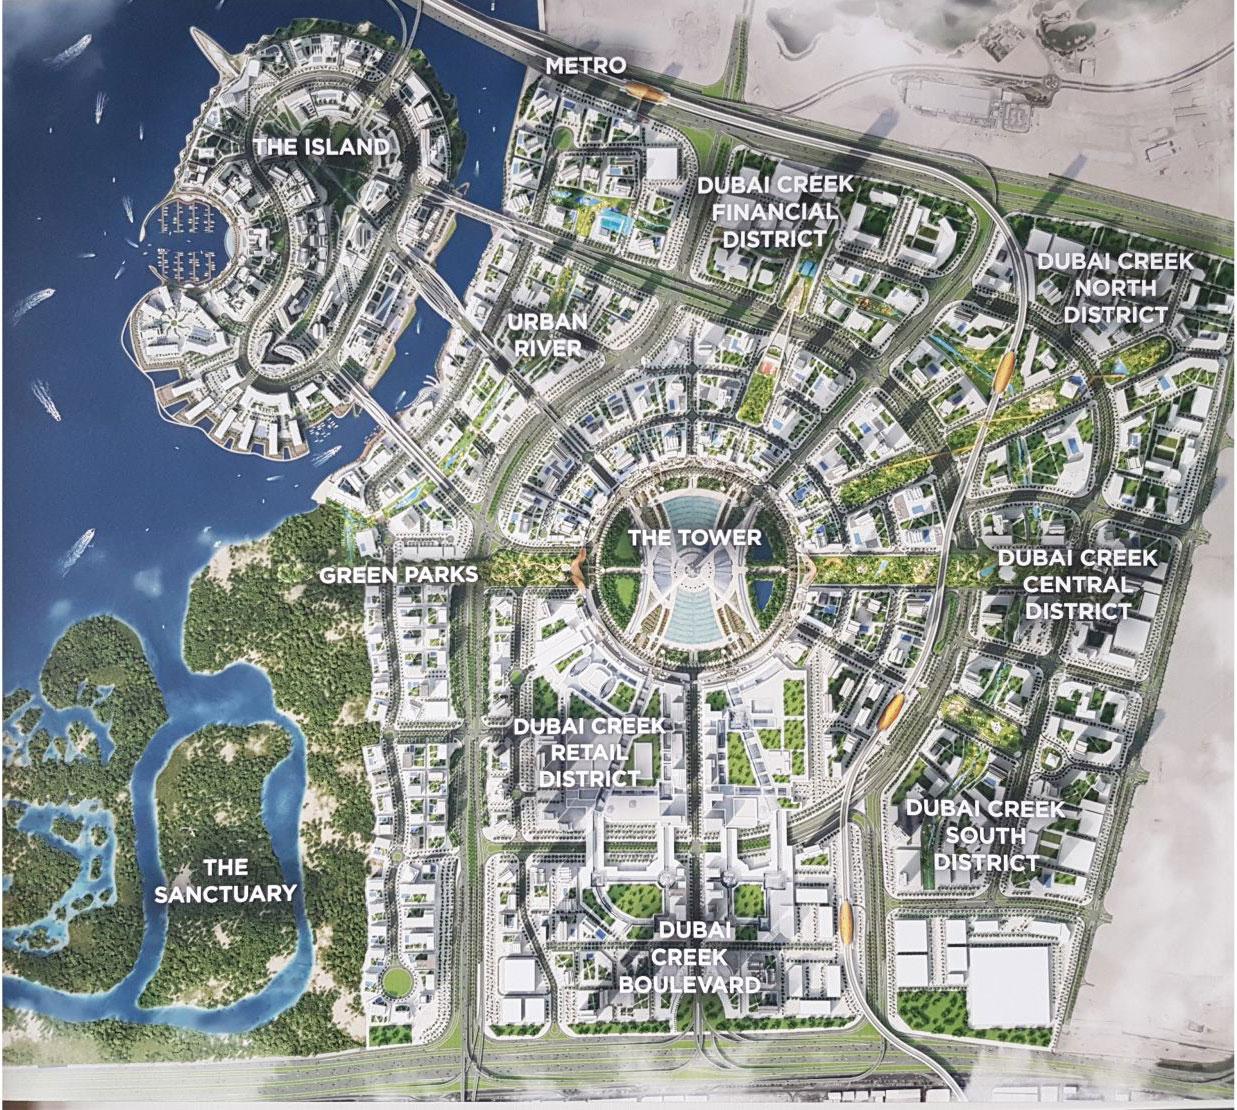 Dubai Creek Harbour Masterplan